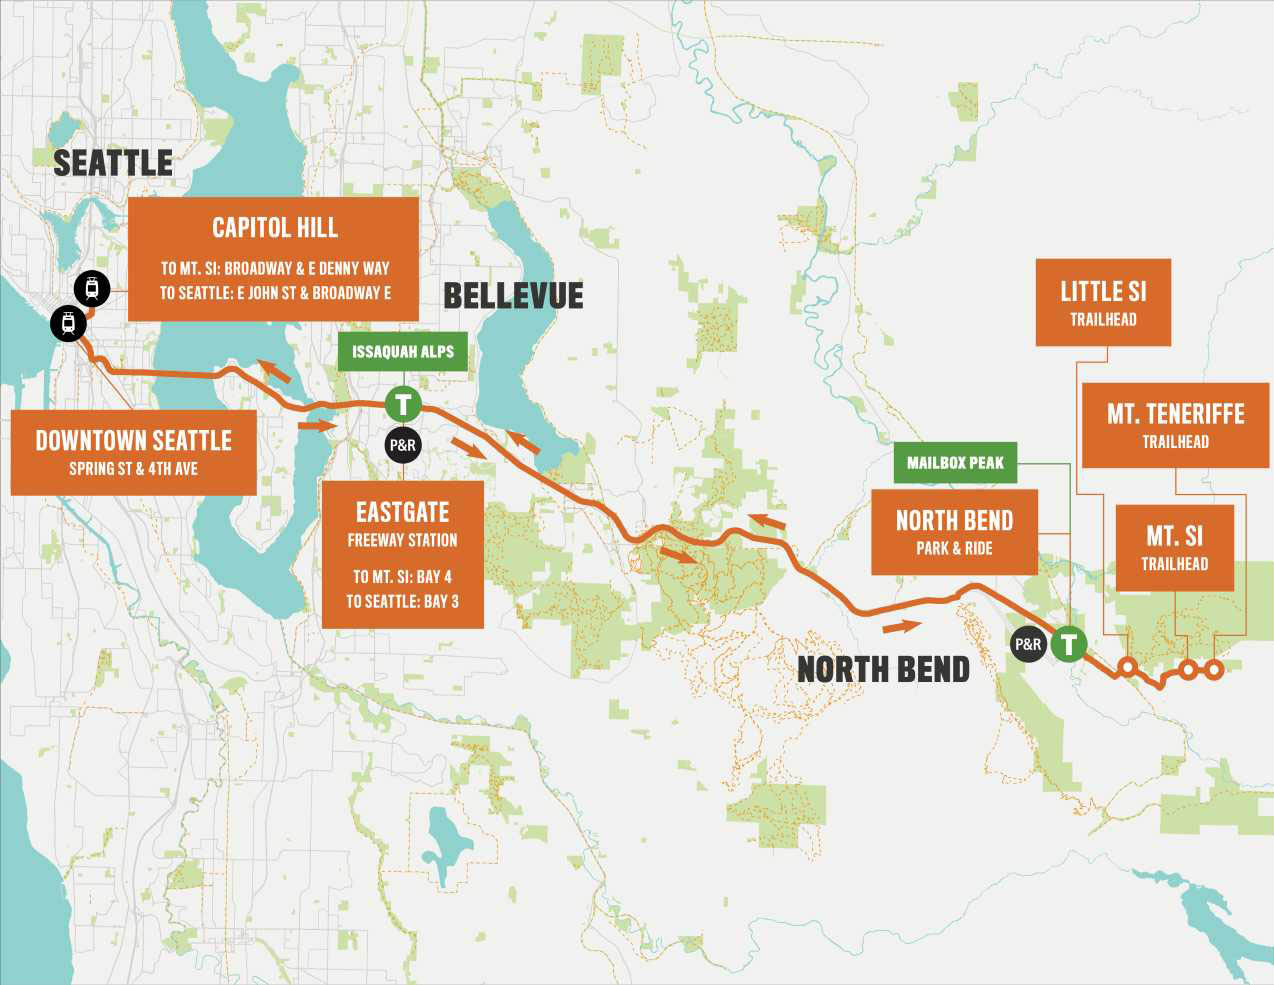 Shuttle to Seattle-area hikes returns for 2019 season